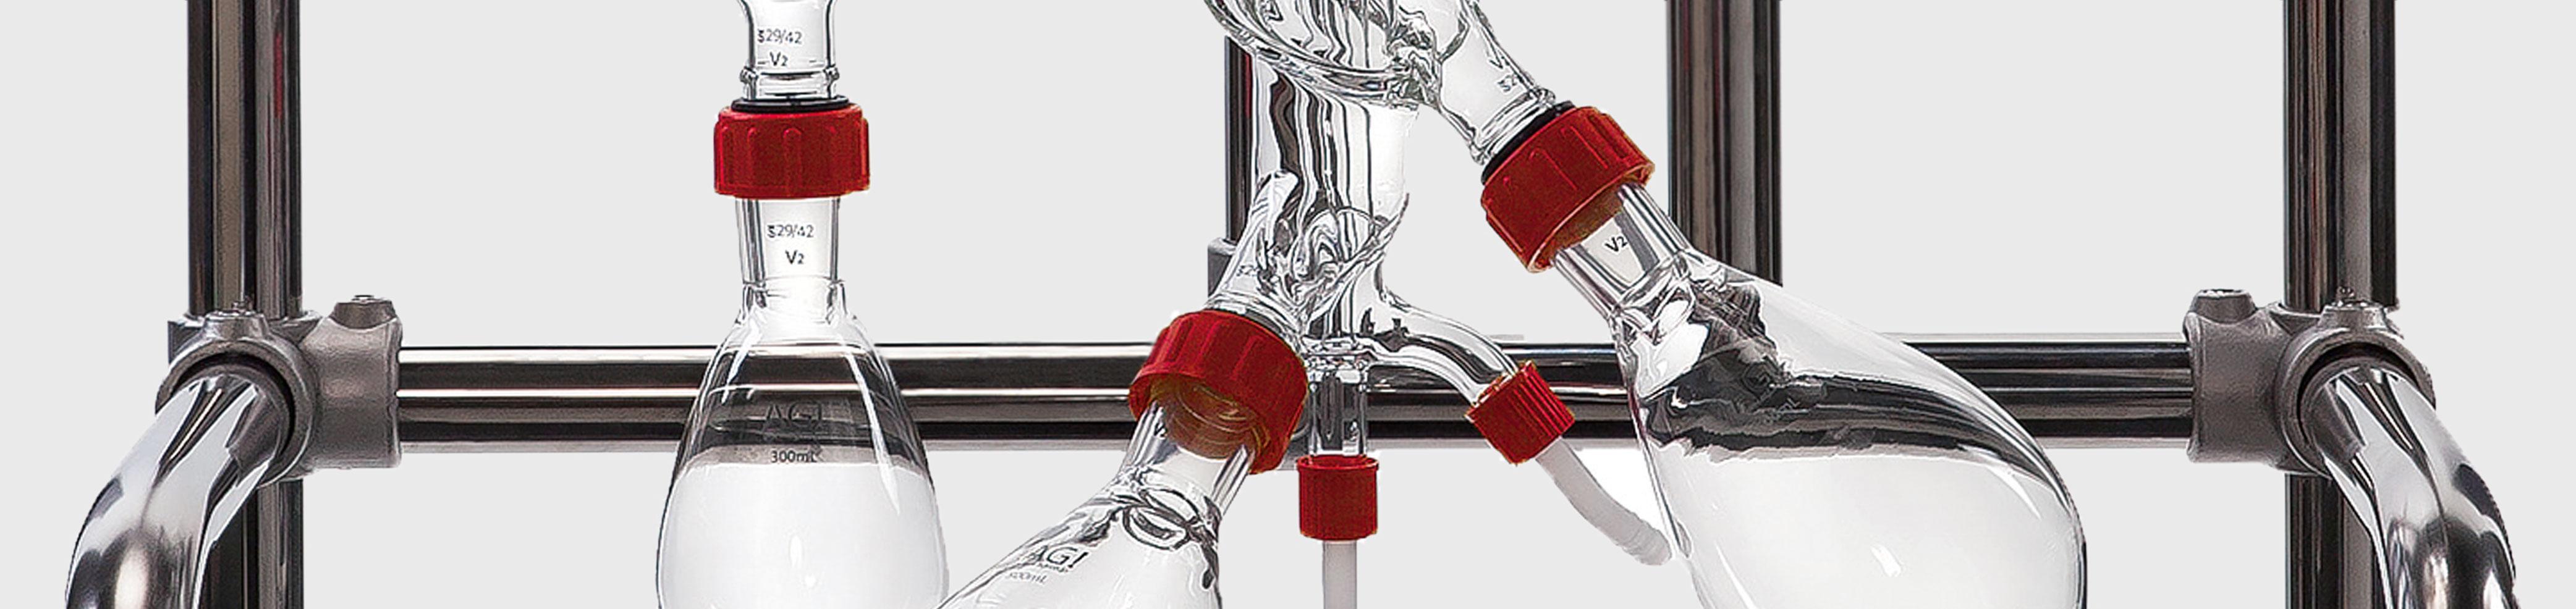 AGI Glassplant Short Path Evaporator